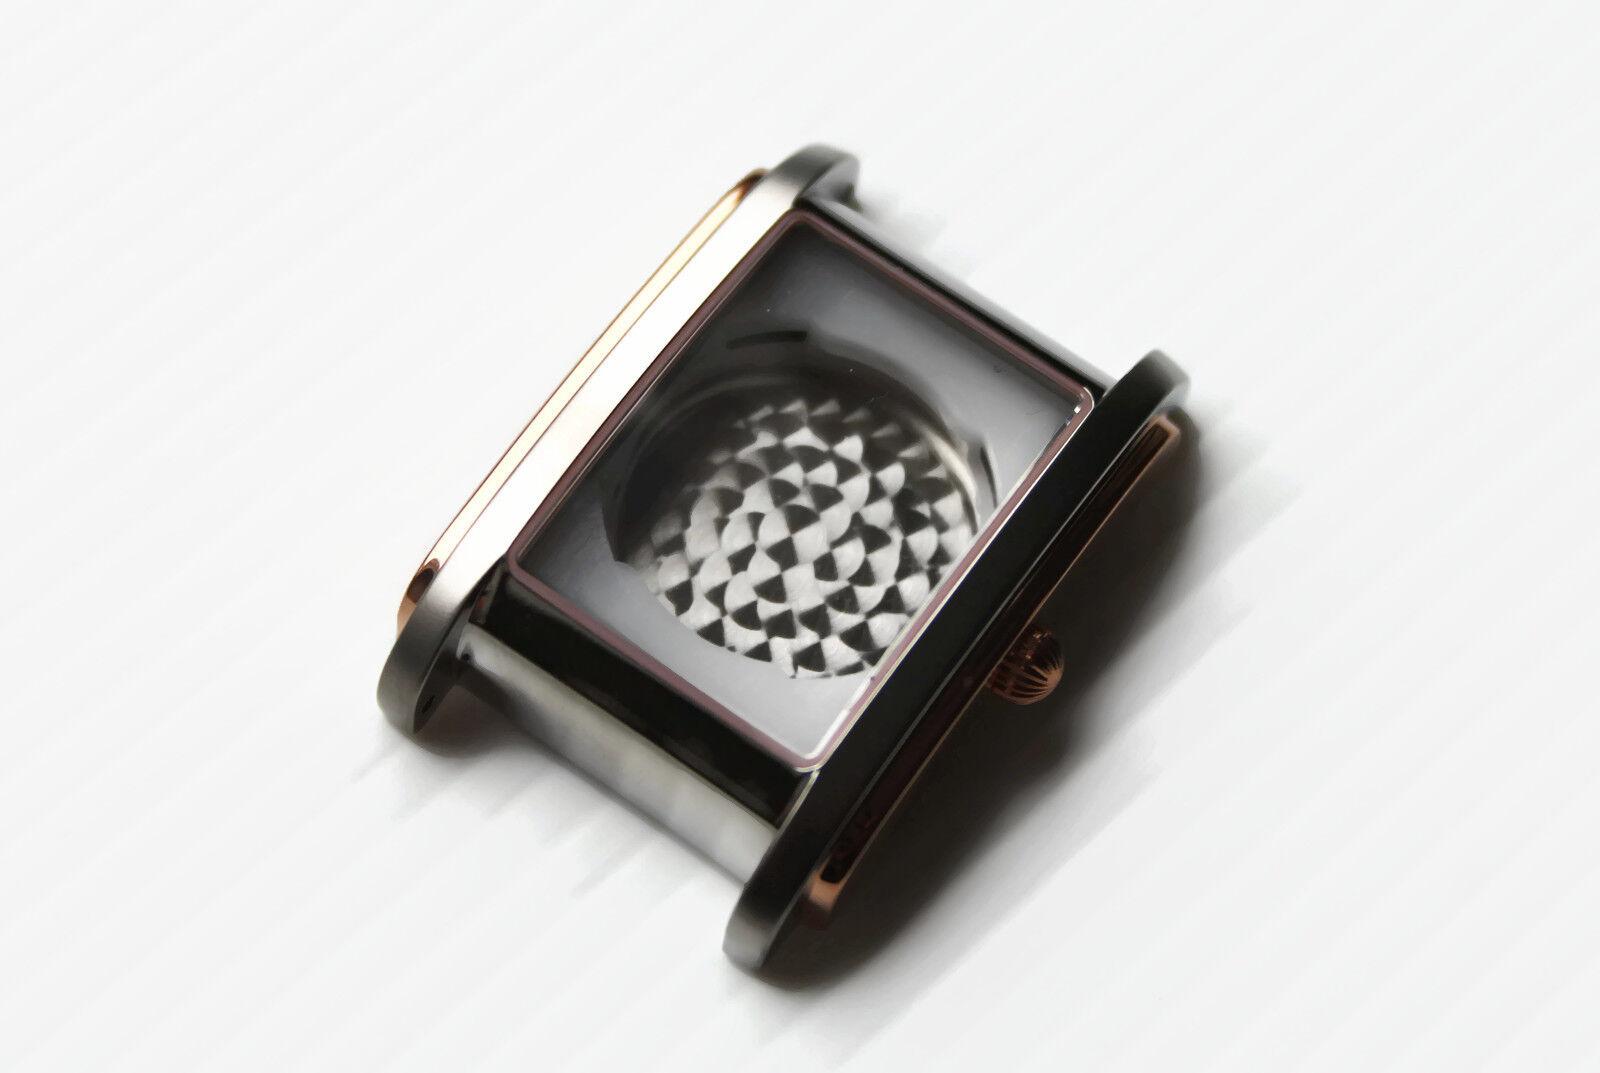 Uhren-Gehäuse ETA 2671 Eckig Bicolor Rose Vergoldet Tonneau Case Square POLJOT